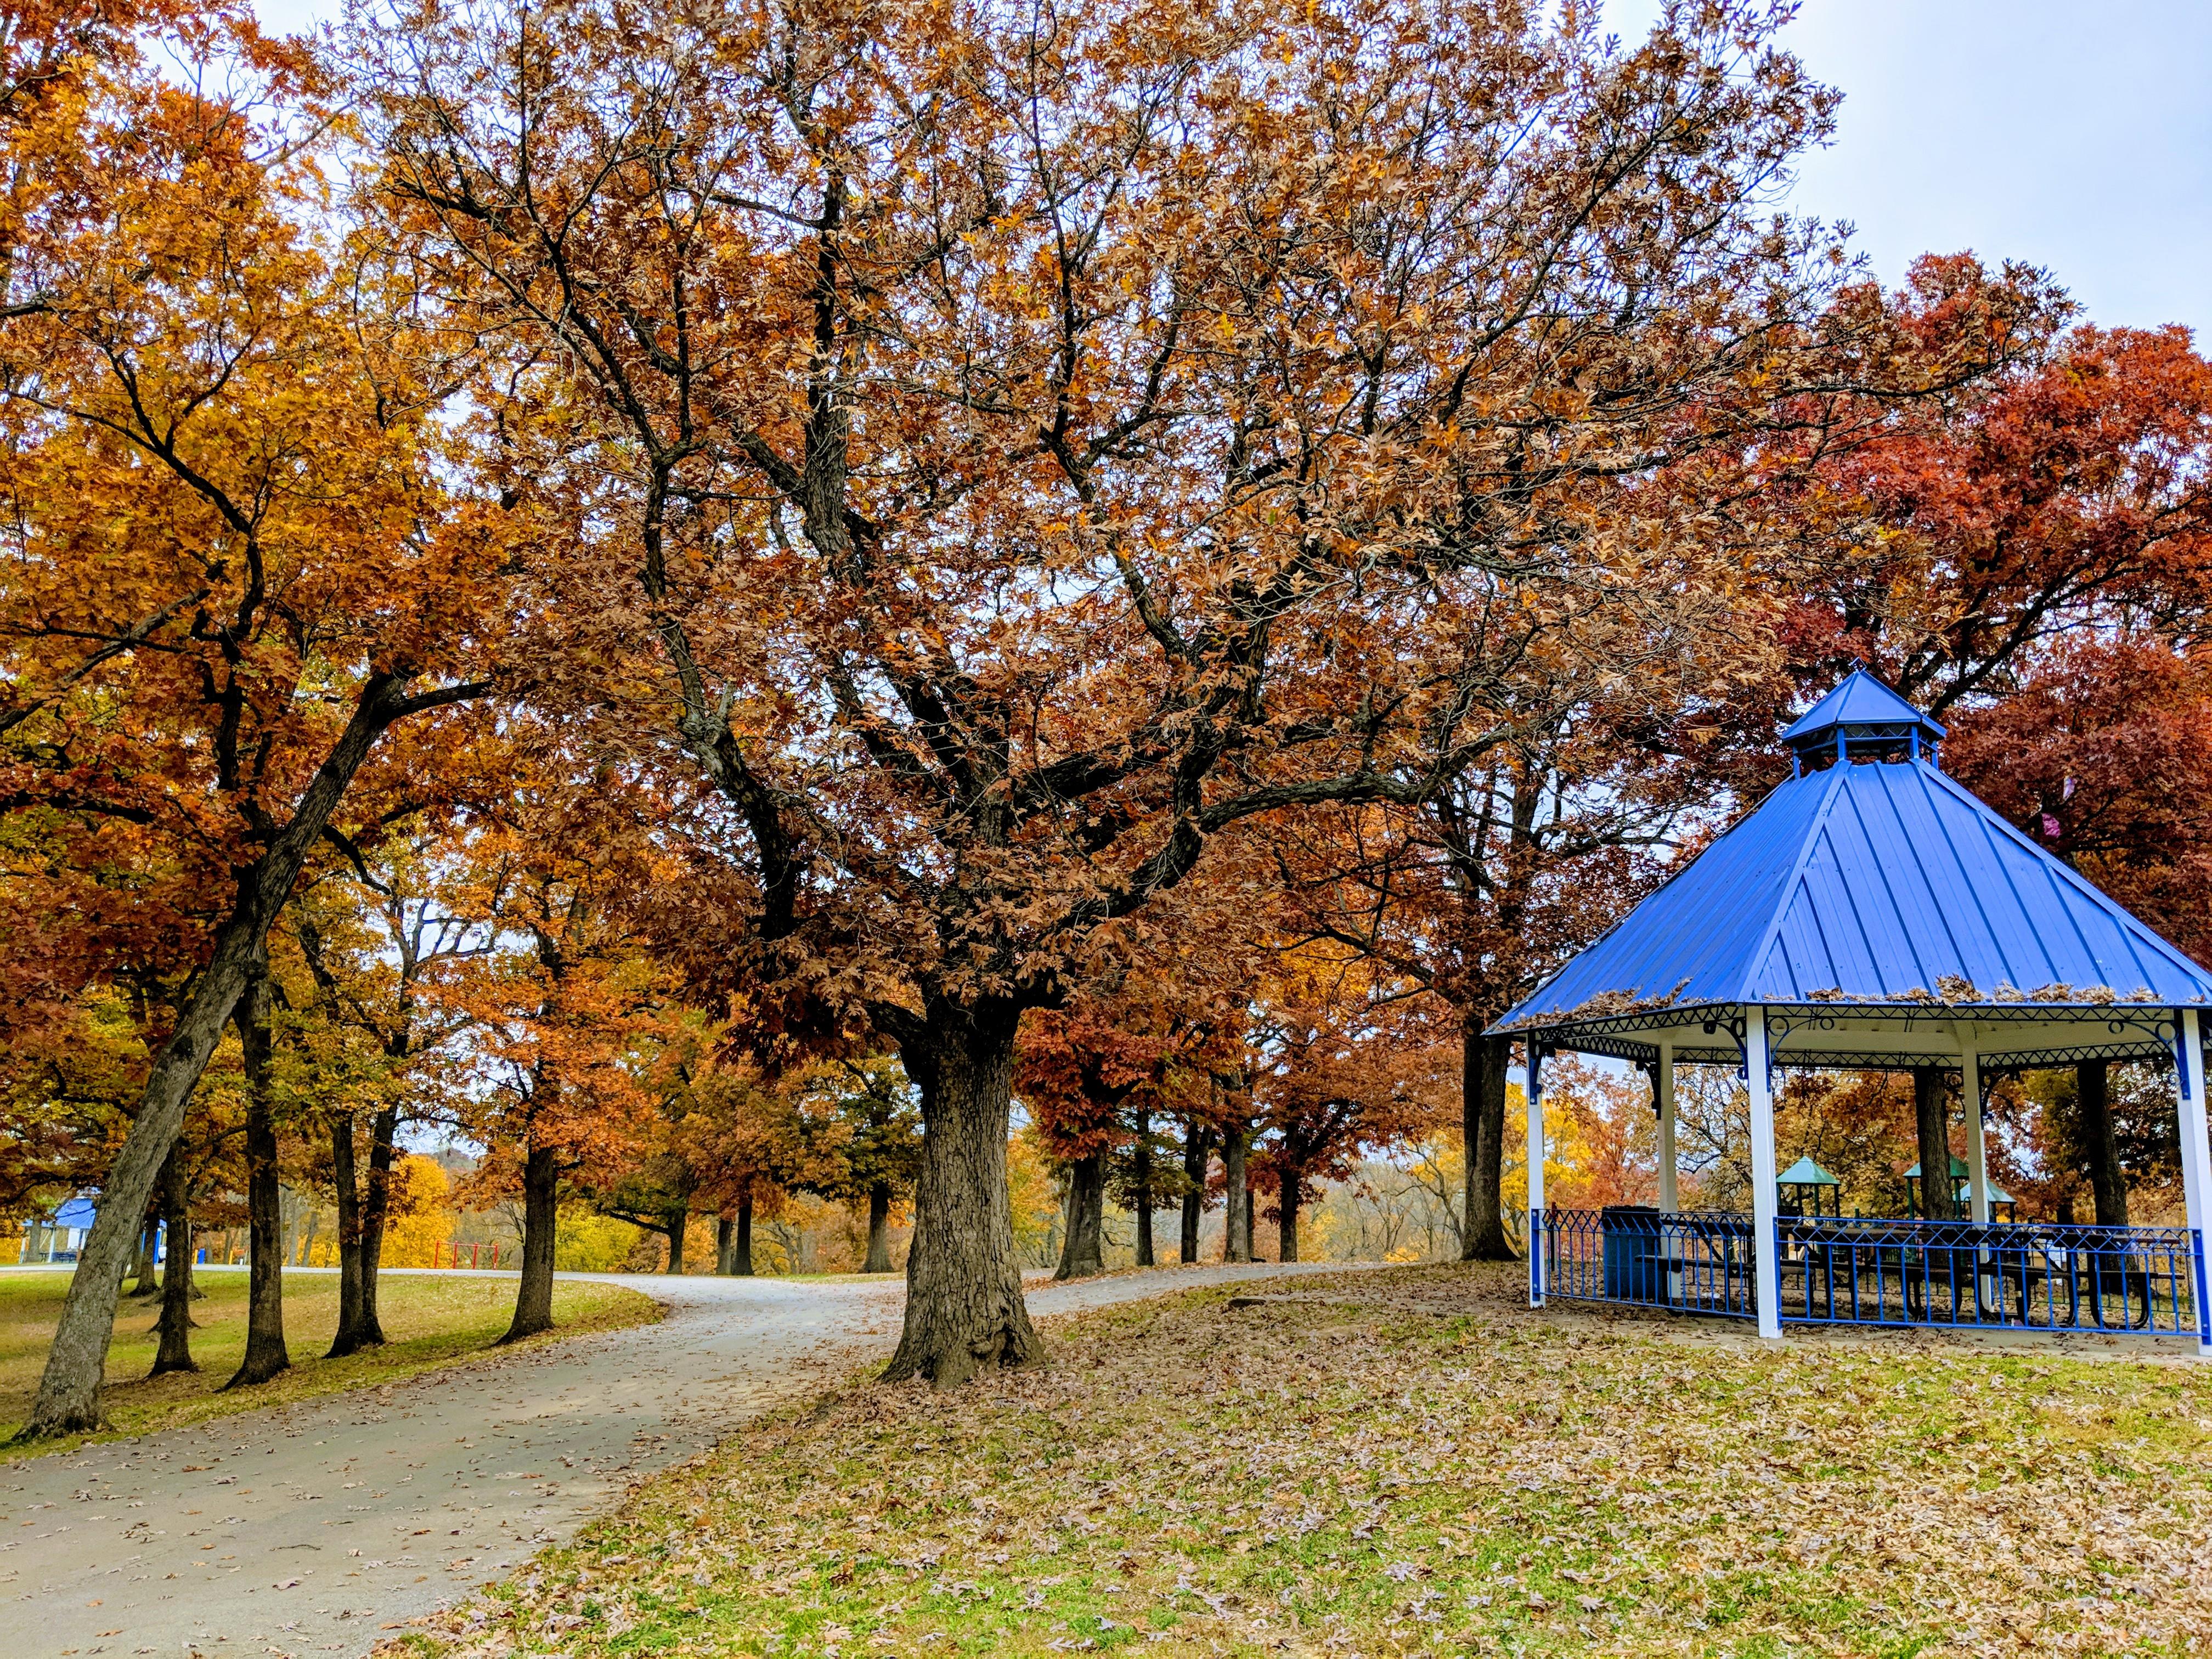 Siloam Mtn Park